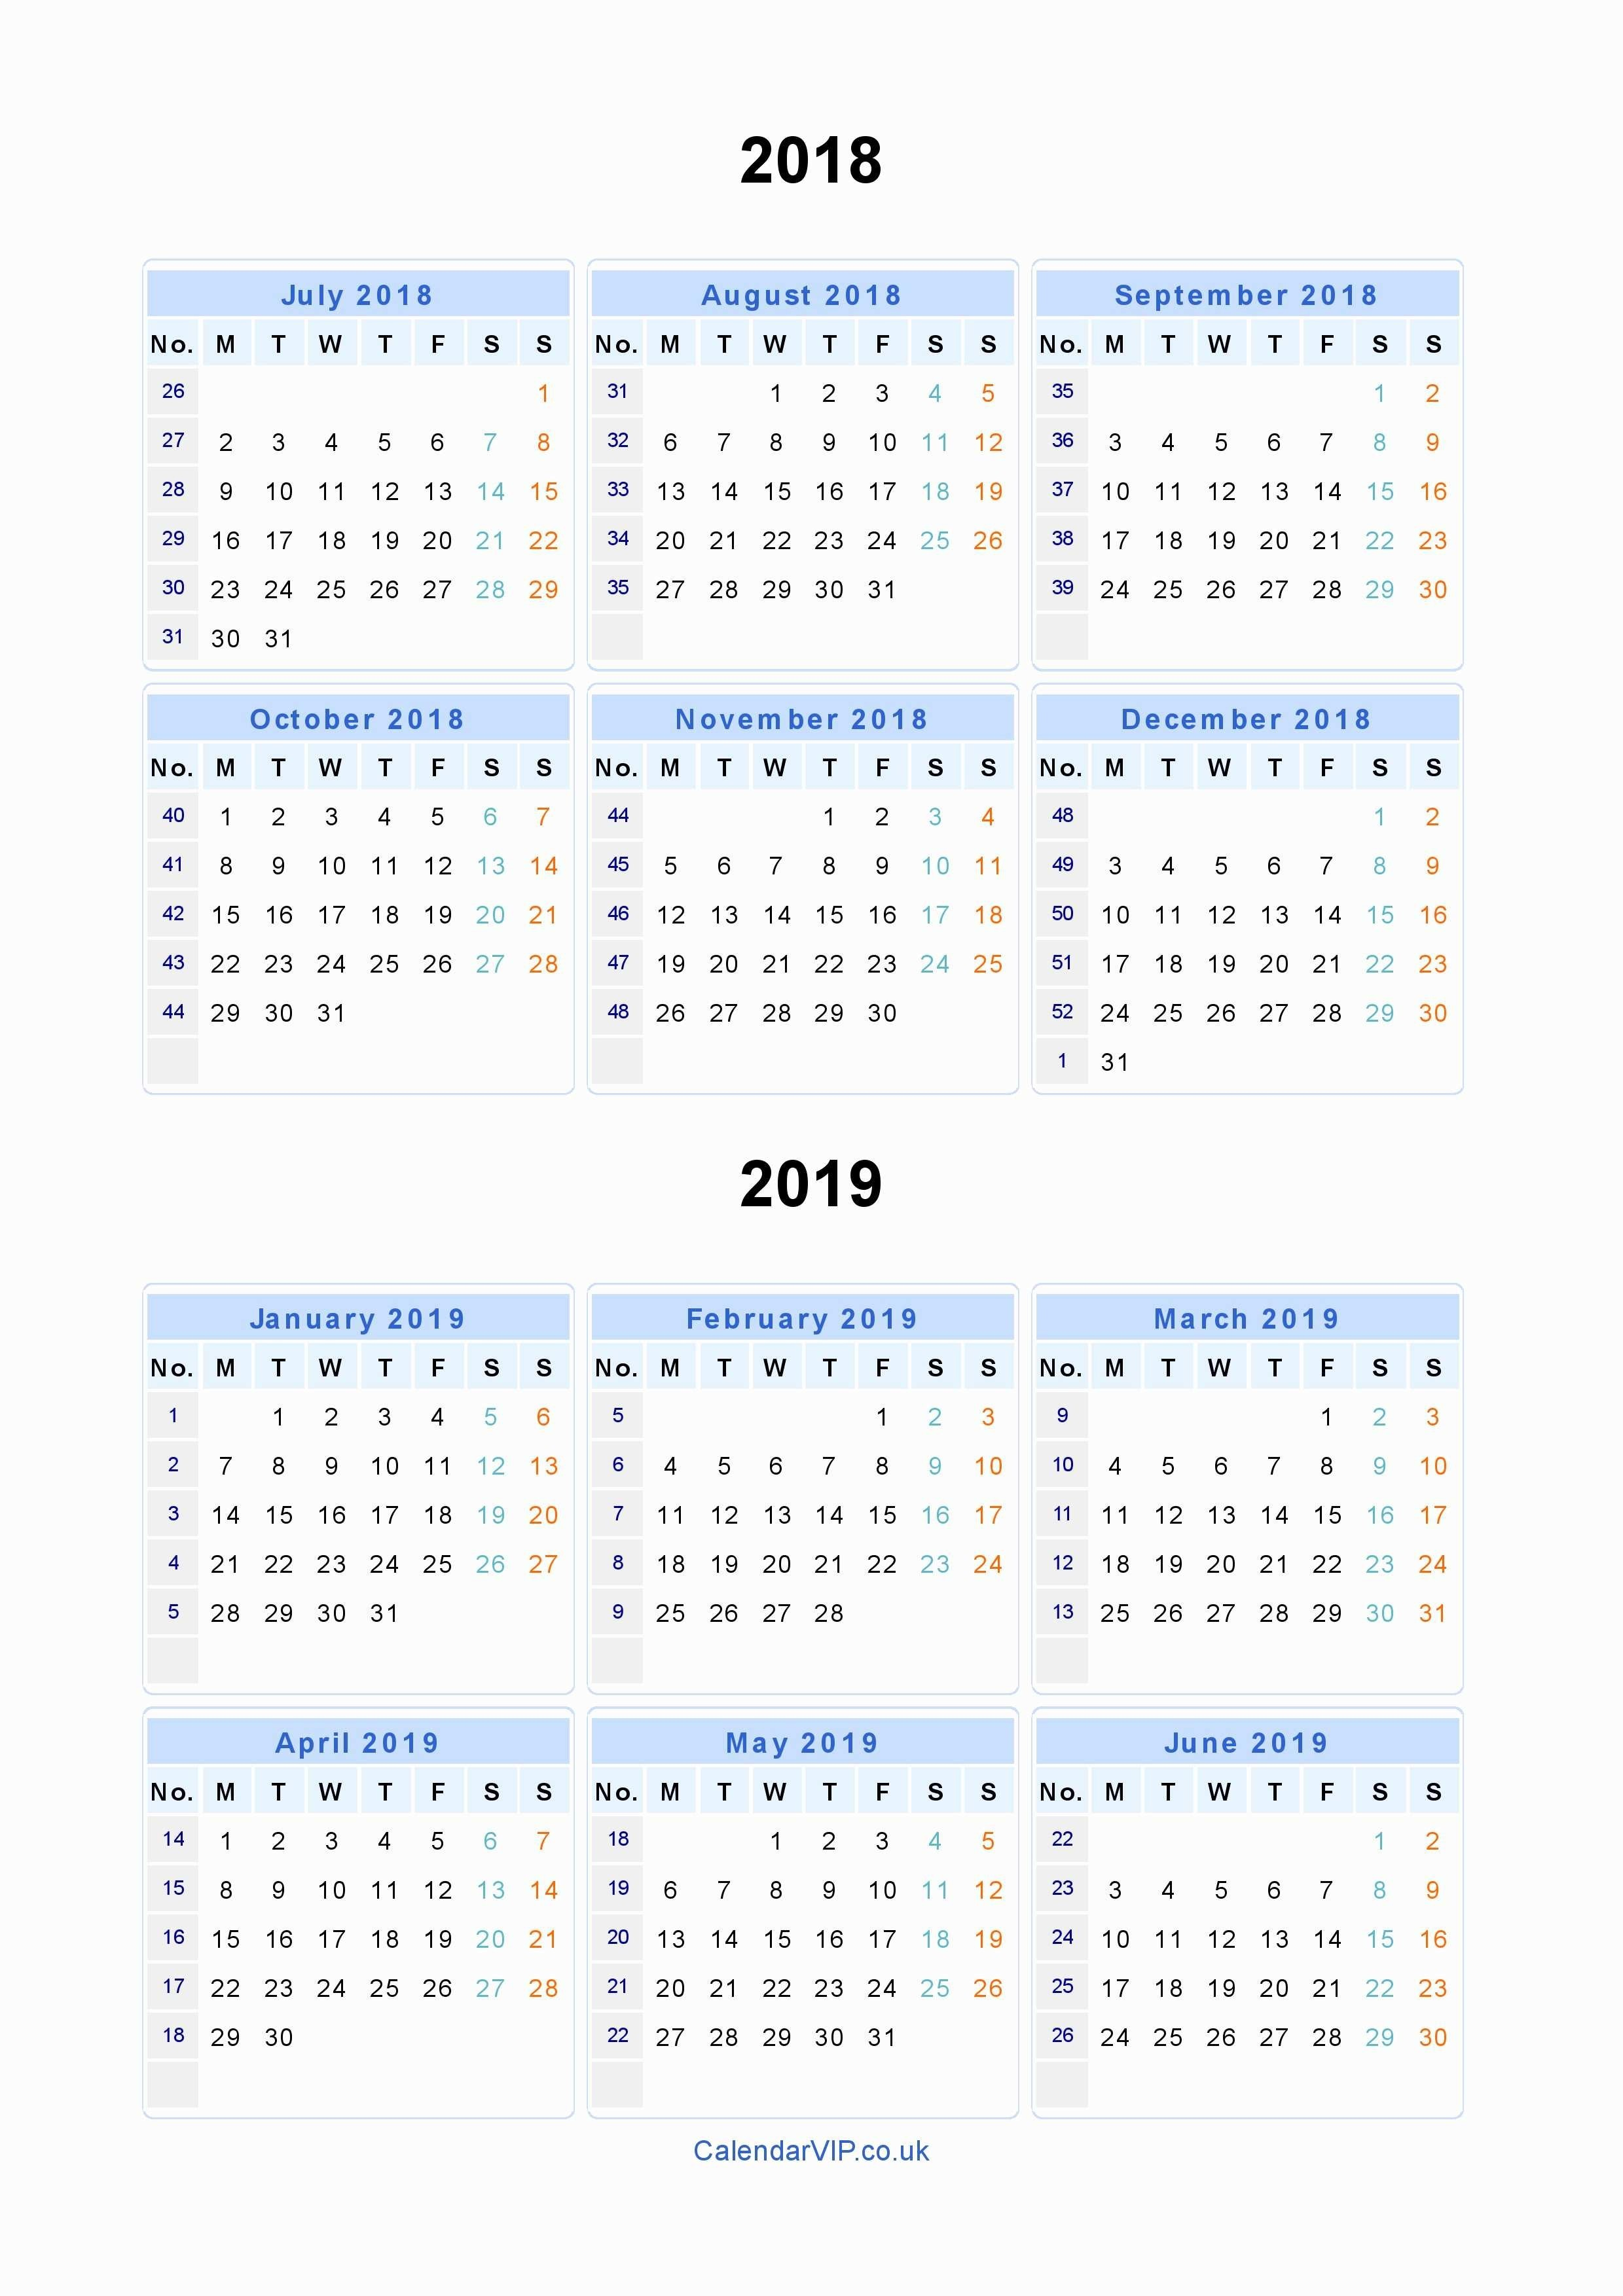 Kalender calendar template document design ideas document of kalender kalentri jum malaysia hari kalentri 2479x3508